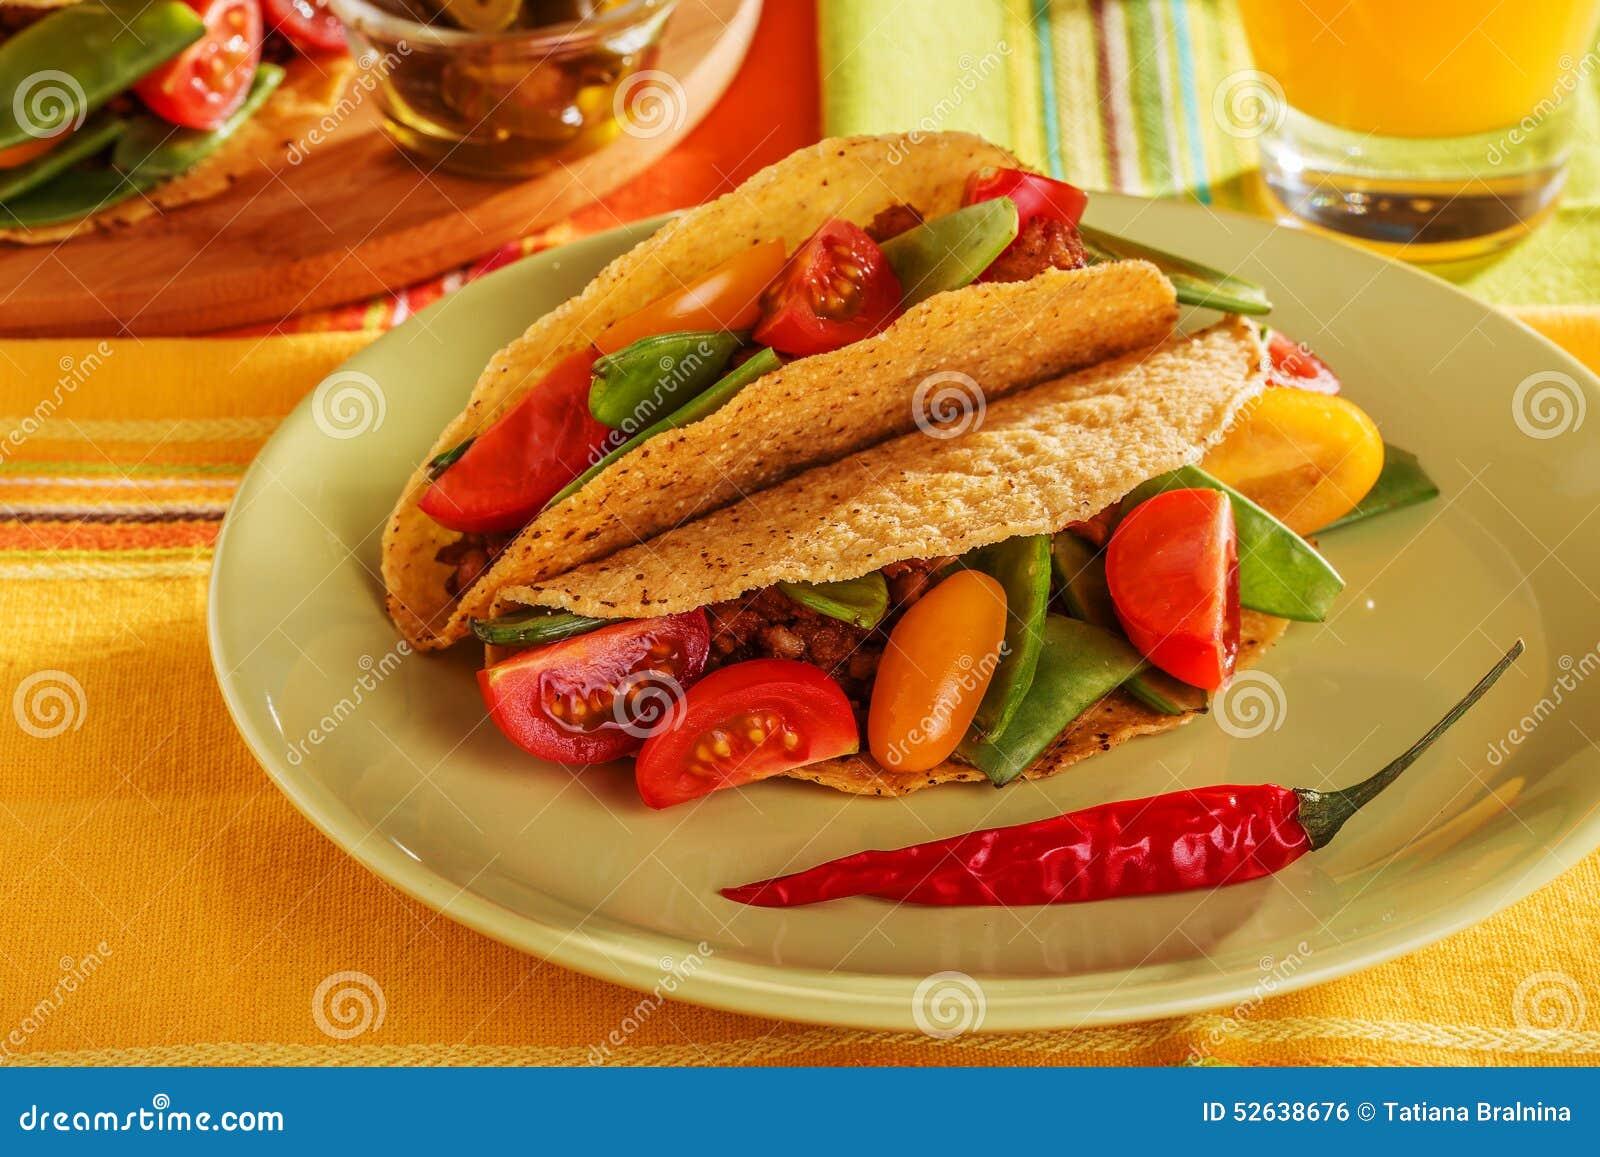 Delicious Mexican Tacos Stock Photo - Image: 52638676